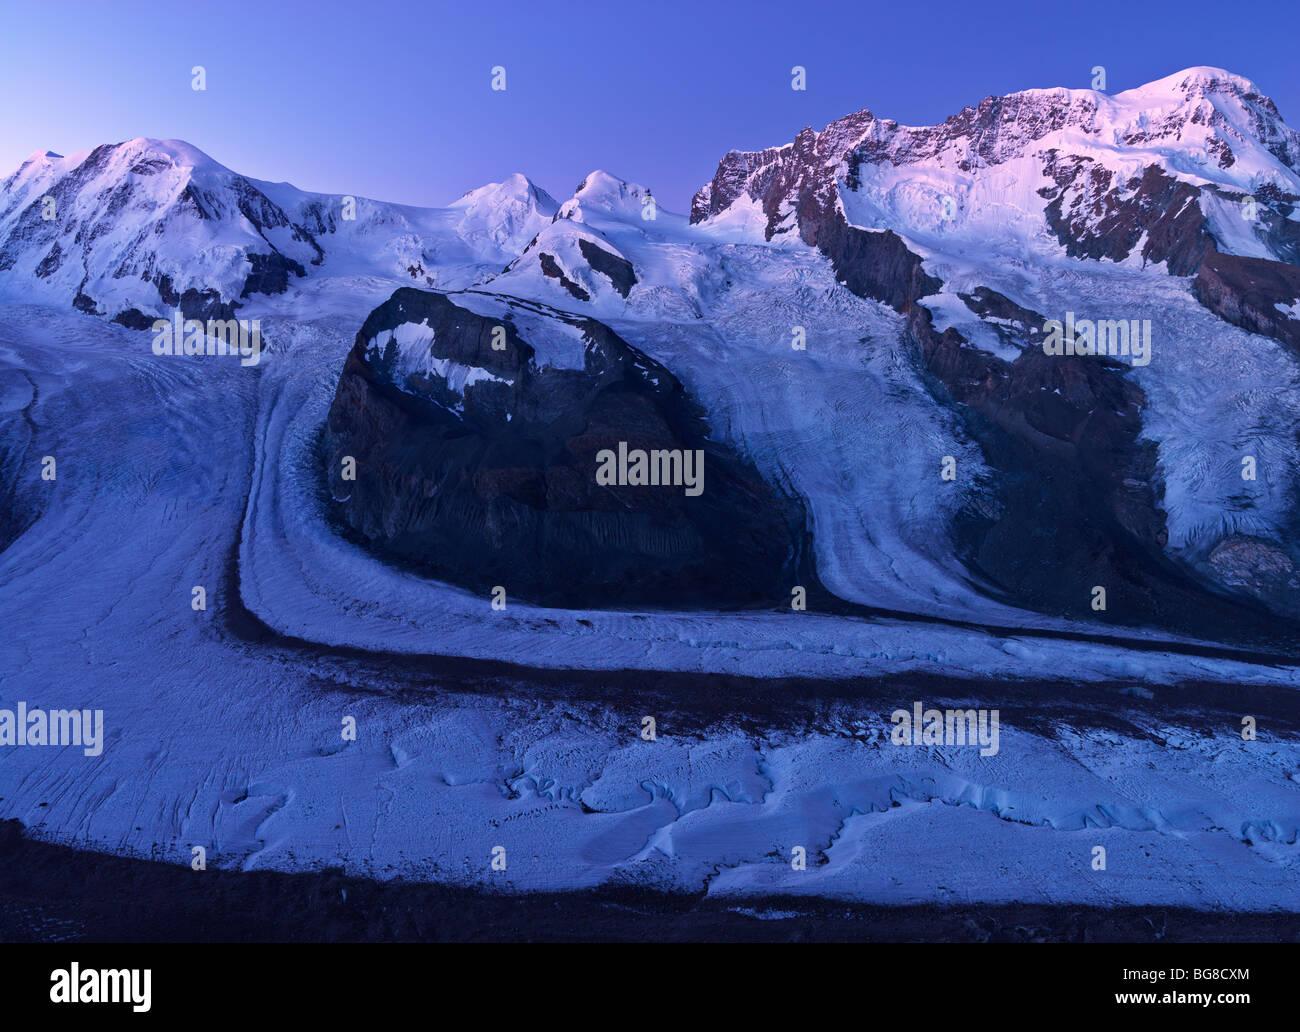 Switzerland, Valais, Zermatt, Gornergrat,peaks of Mount Rosa, Liskamm, and Breithorn and the Gorner Glacier - Stock Image